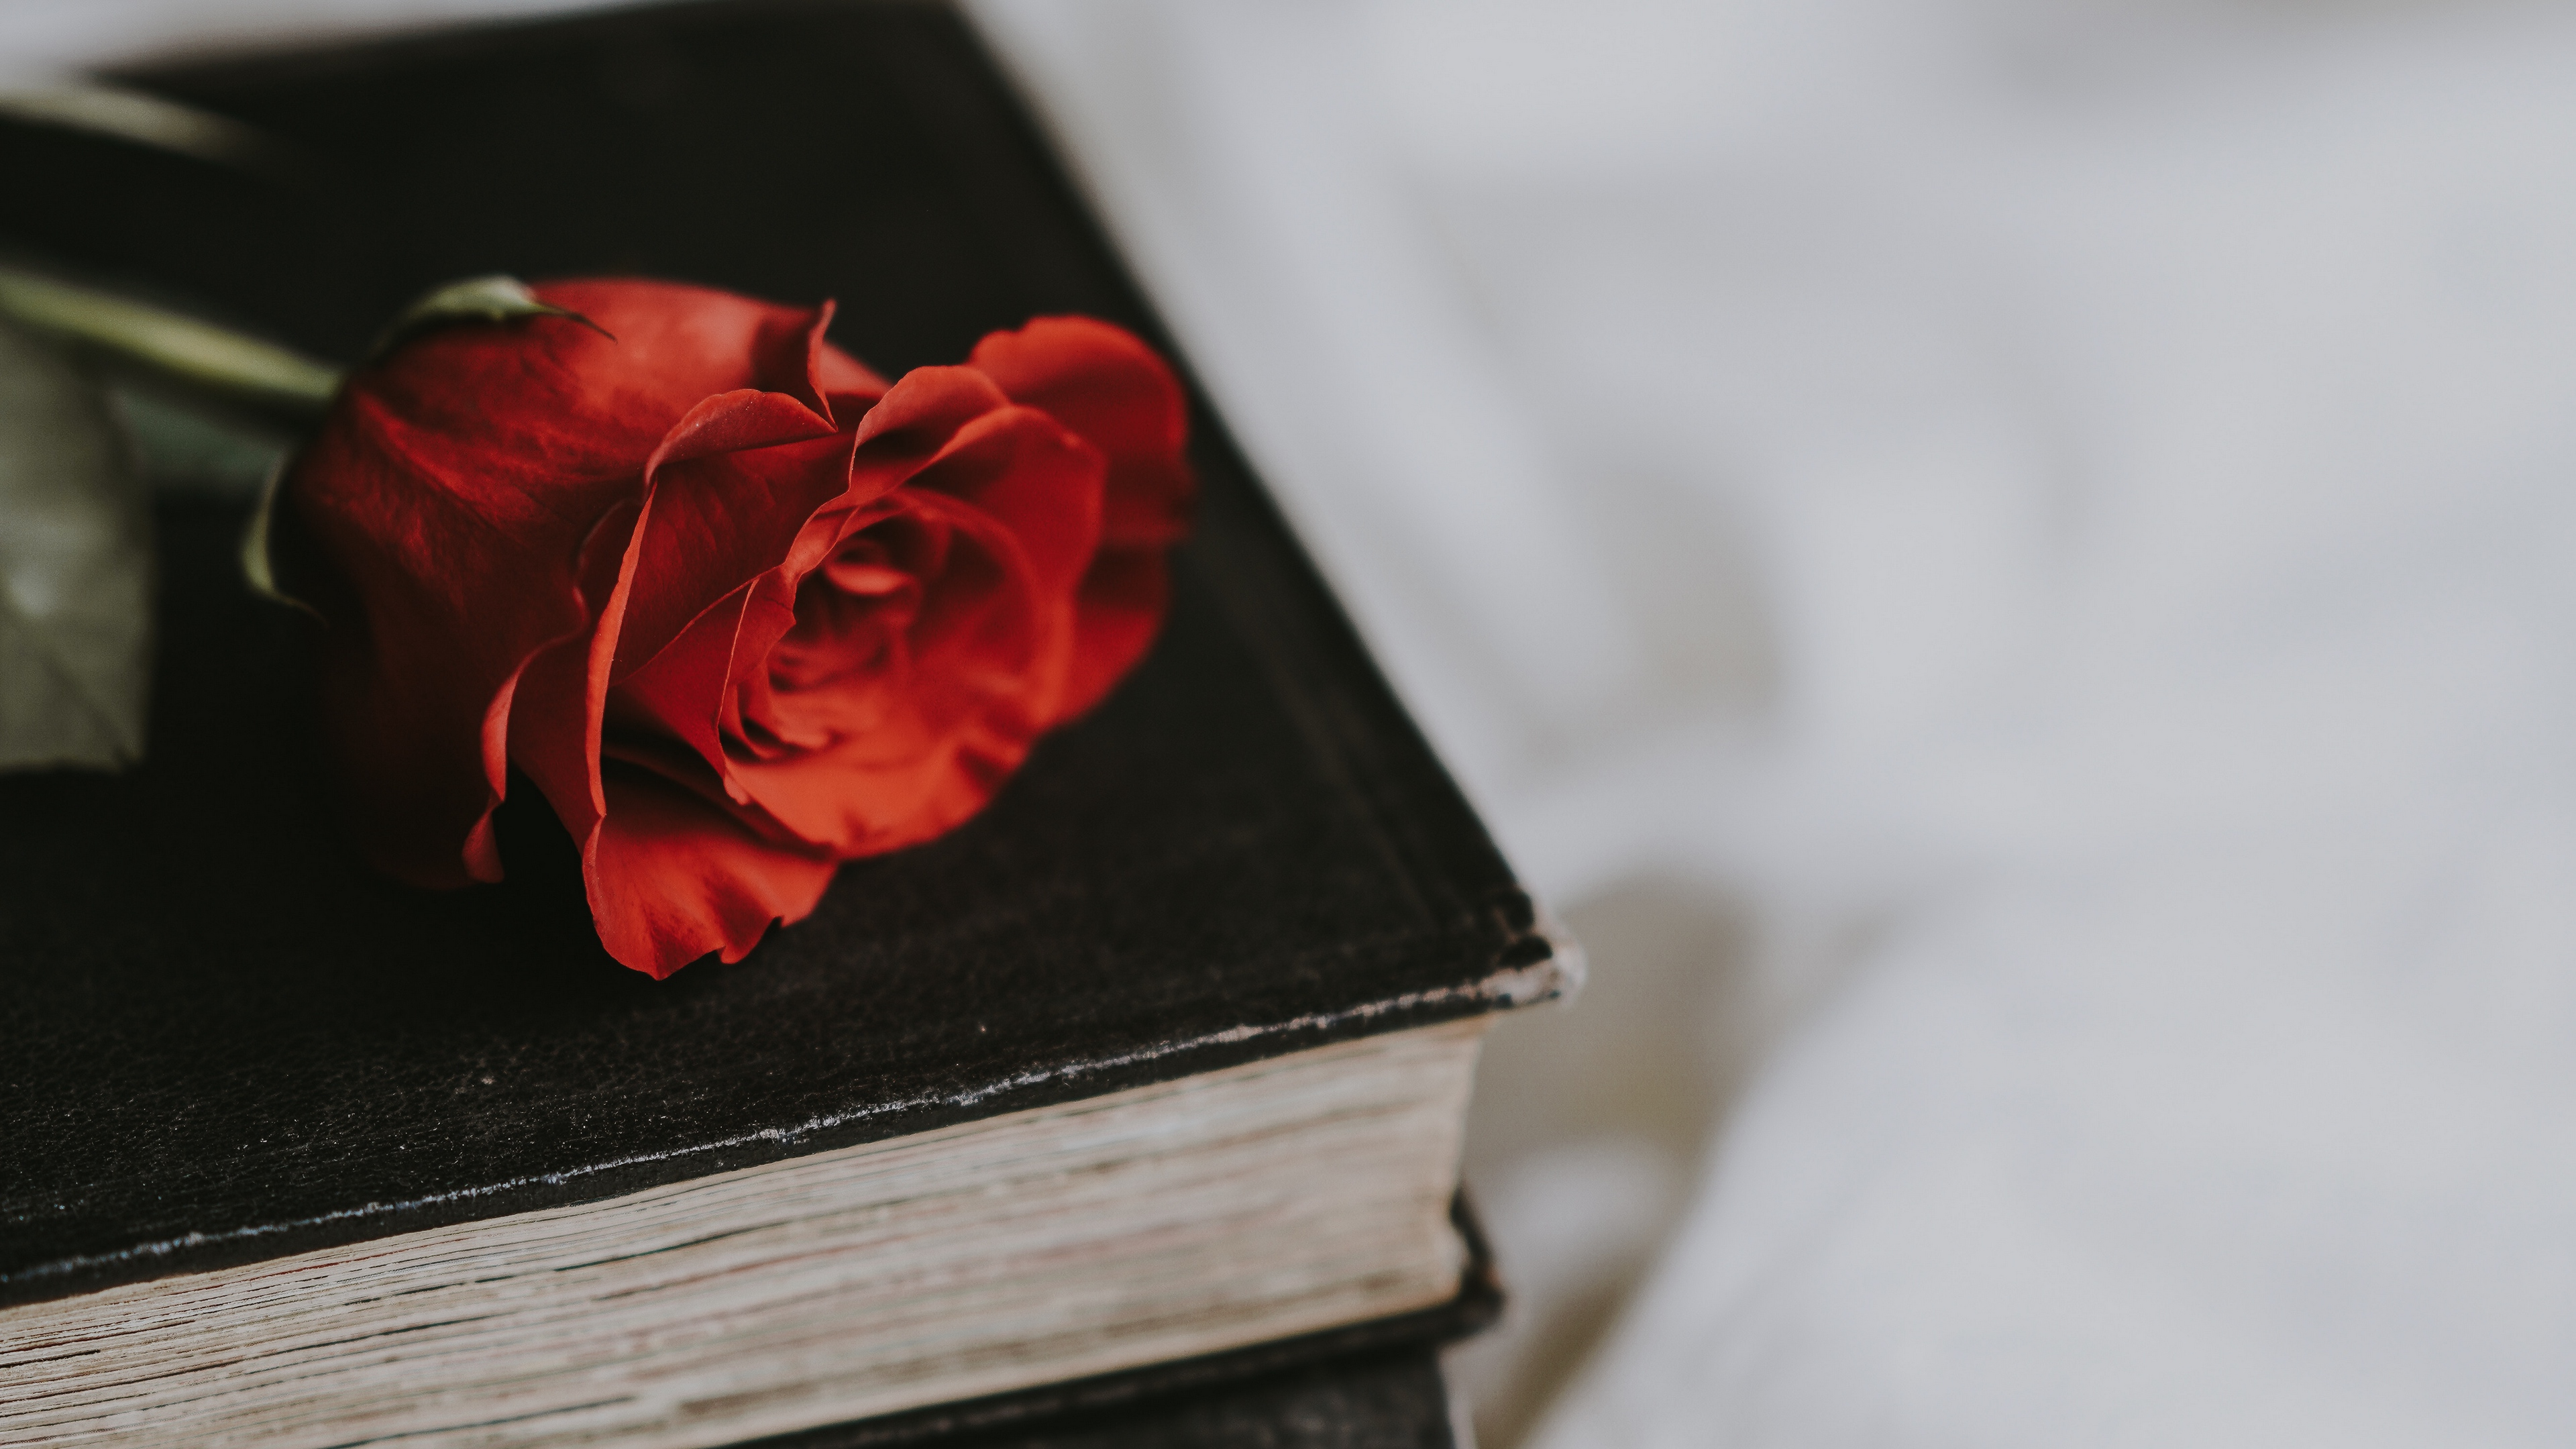 rose book flower blur 4k 1540064953 - rose, book, flower, blur 4k - Rose, flower, Book